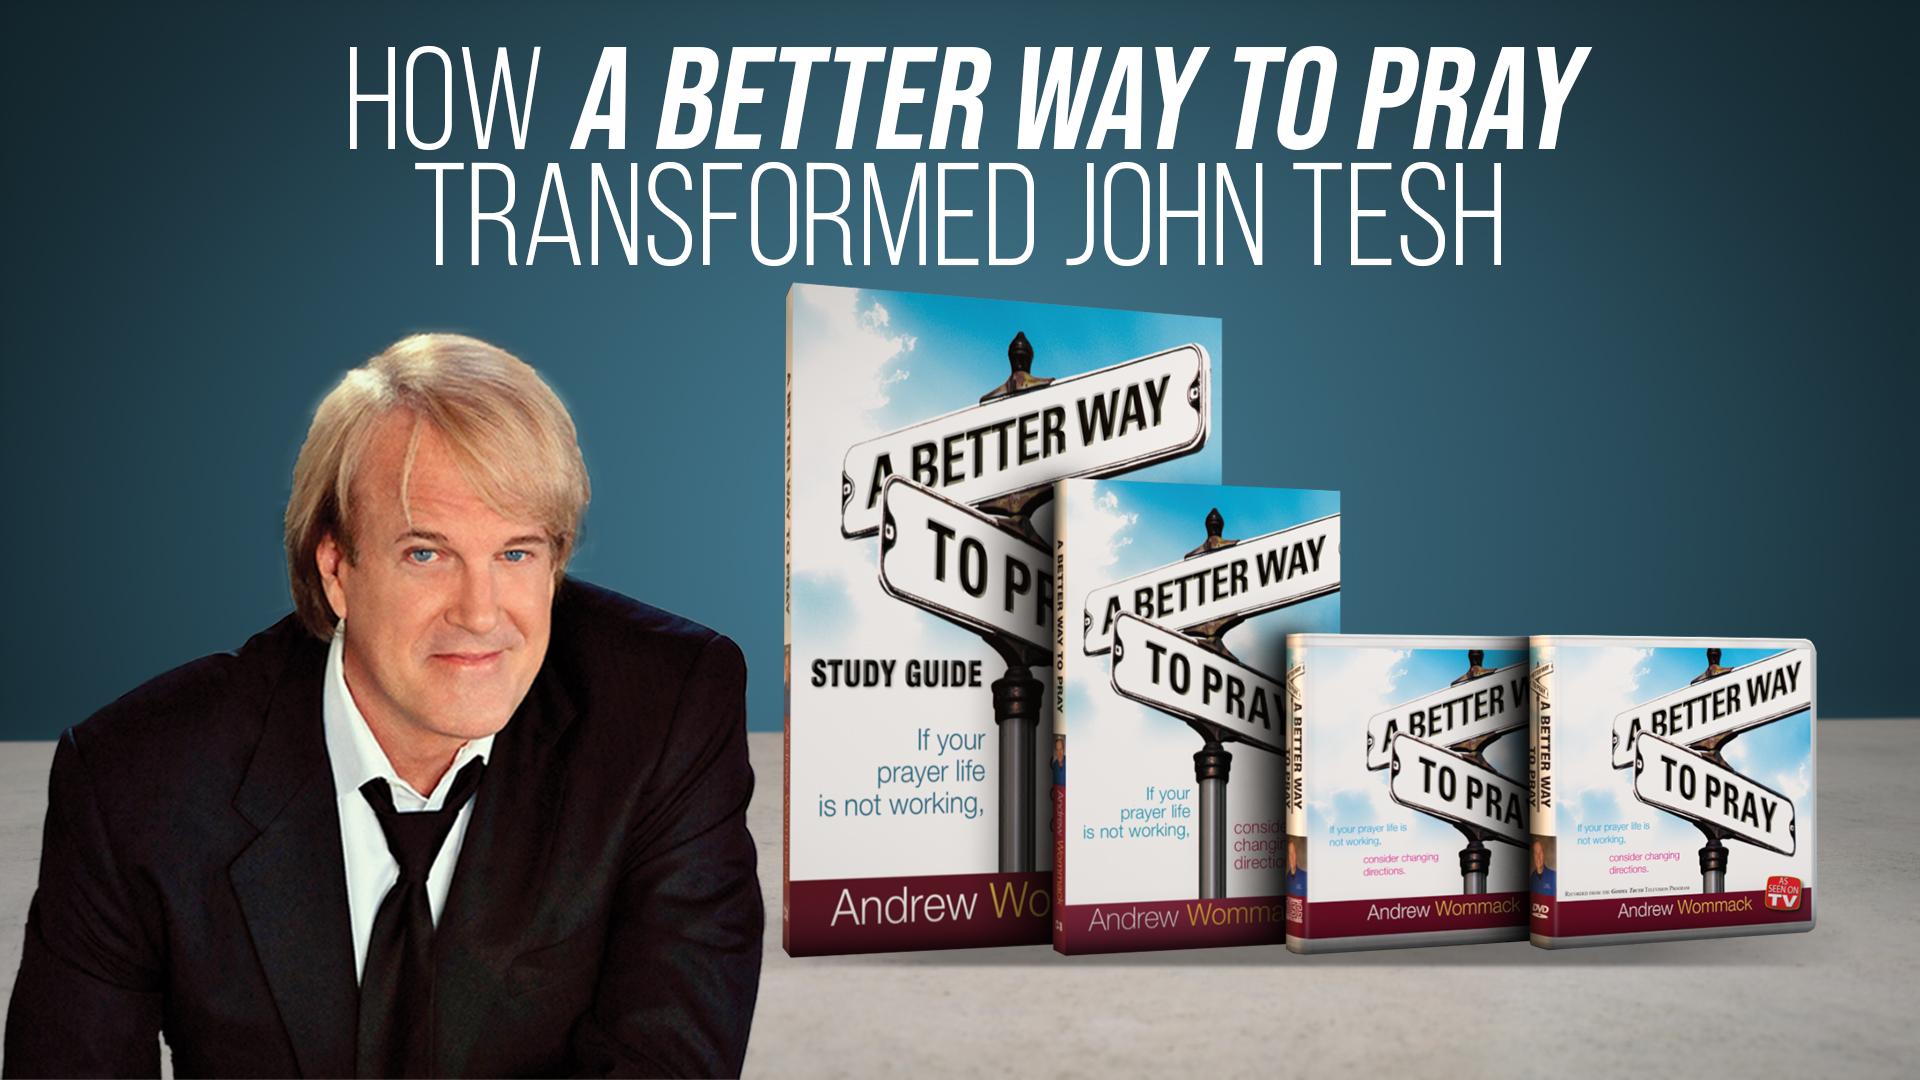 A Better Way To Pray Transformed John Tesh